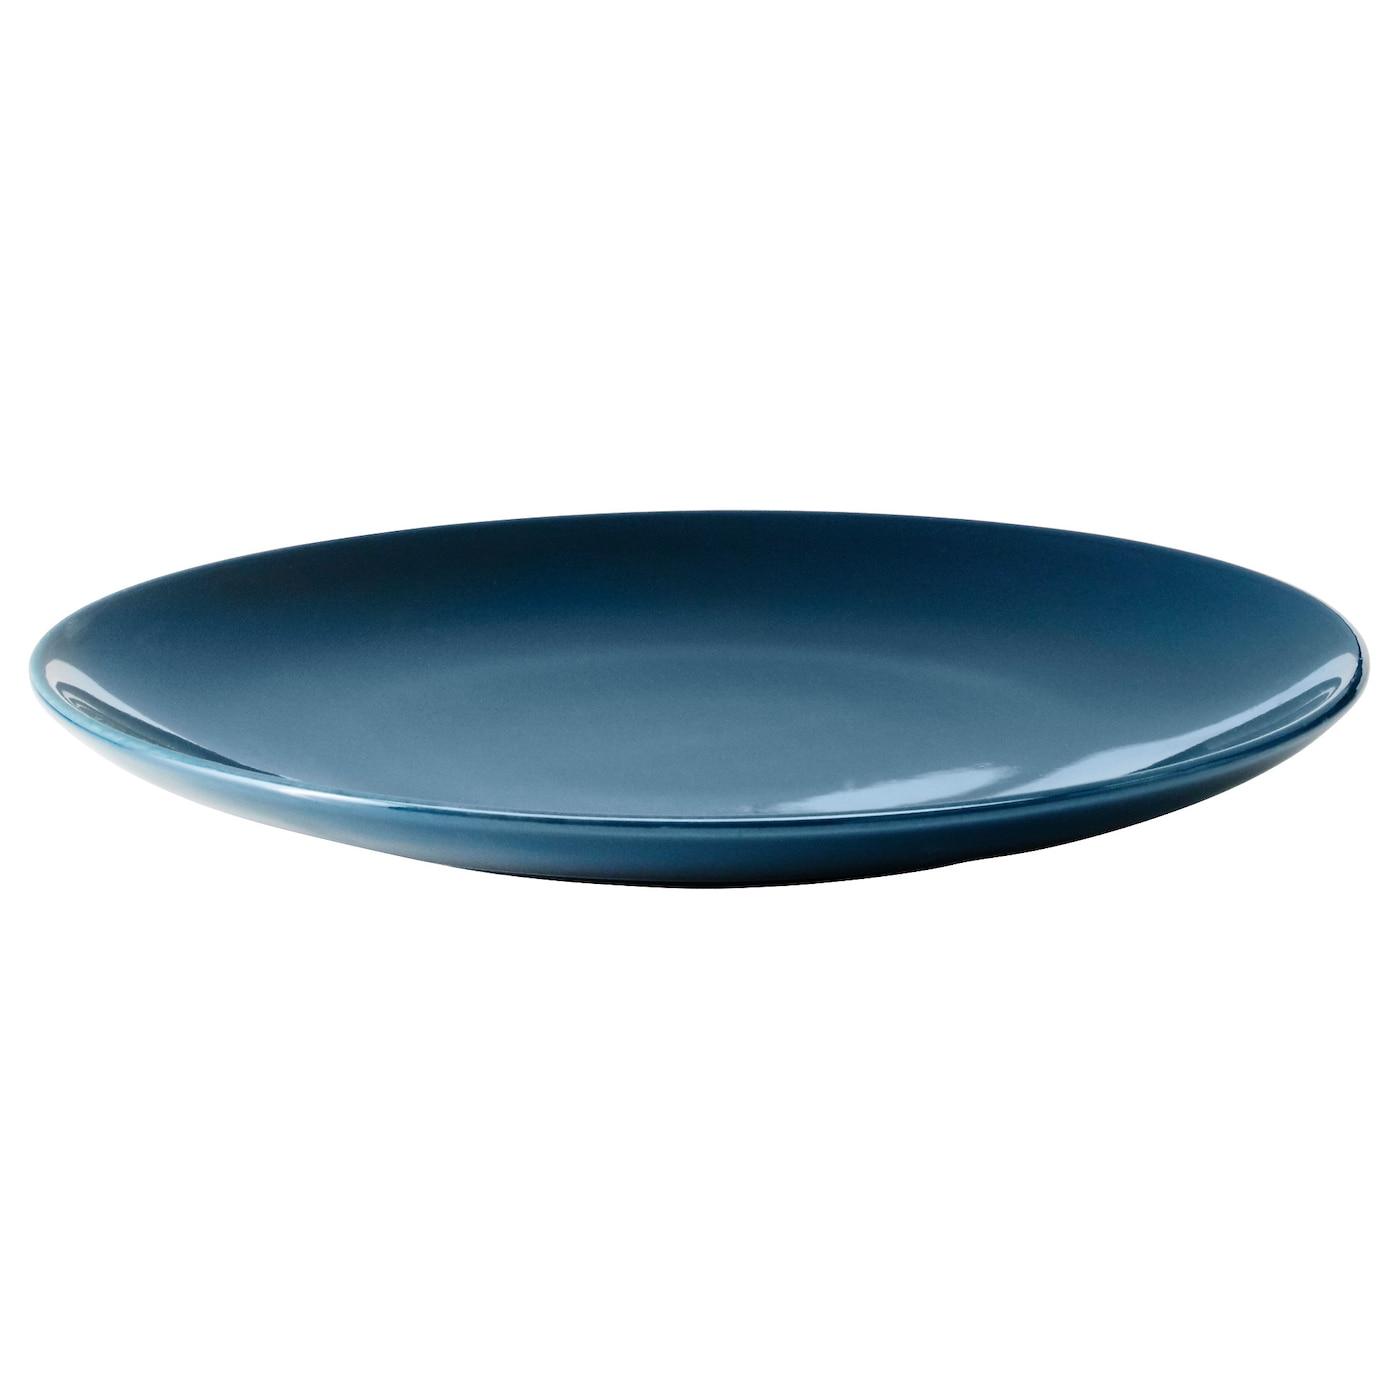 f rgrik petite assiette fa ence turquoise fonc 21 cm ikea. Black Bedroom Furniture Sets. Home Design Ideas